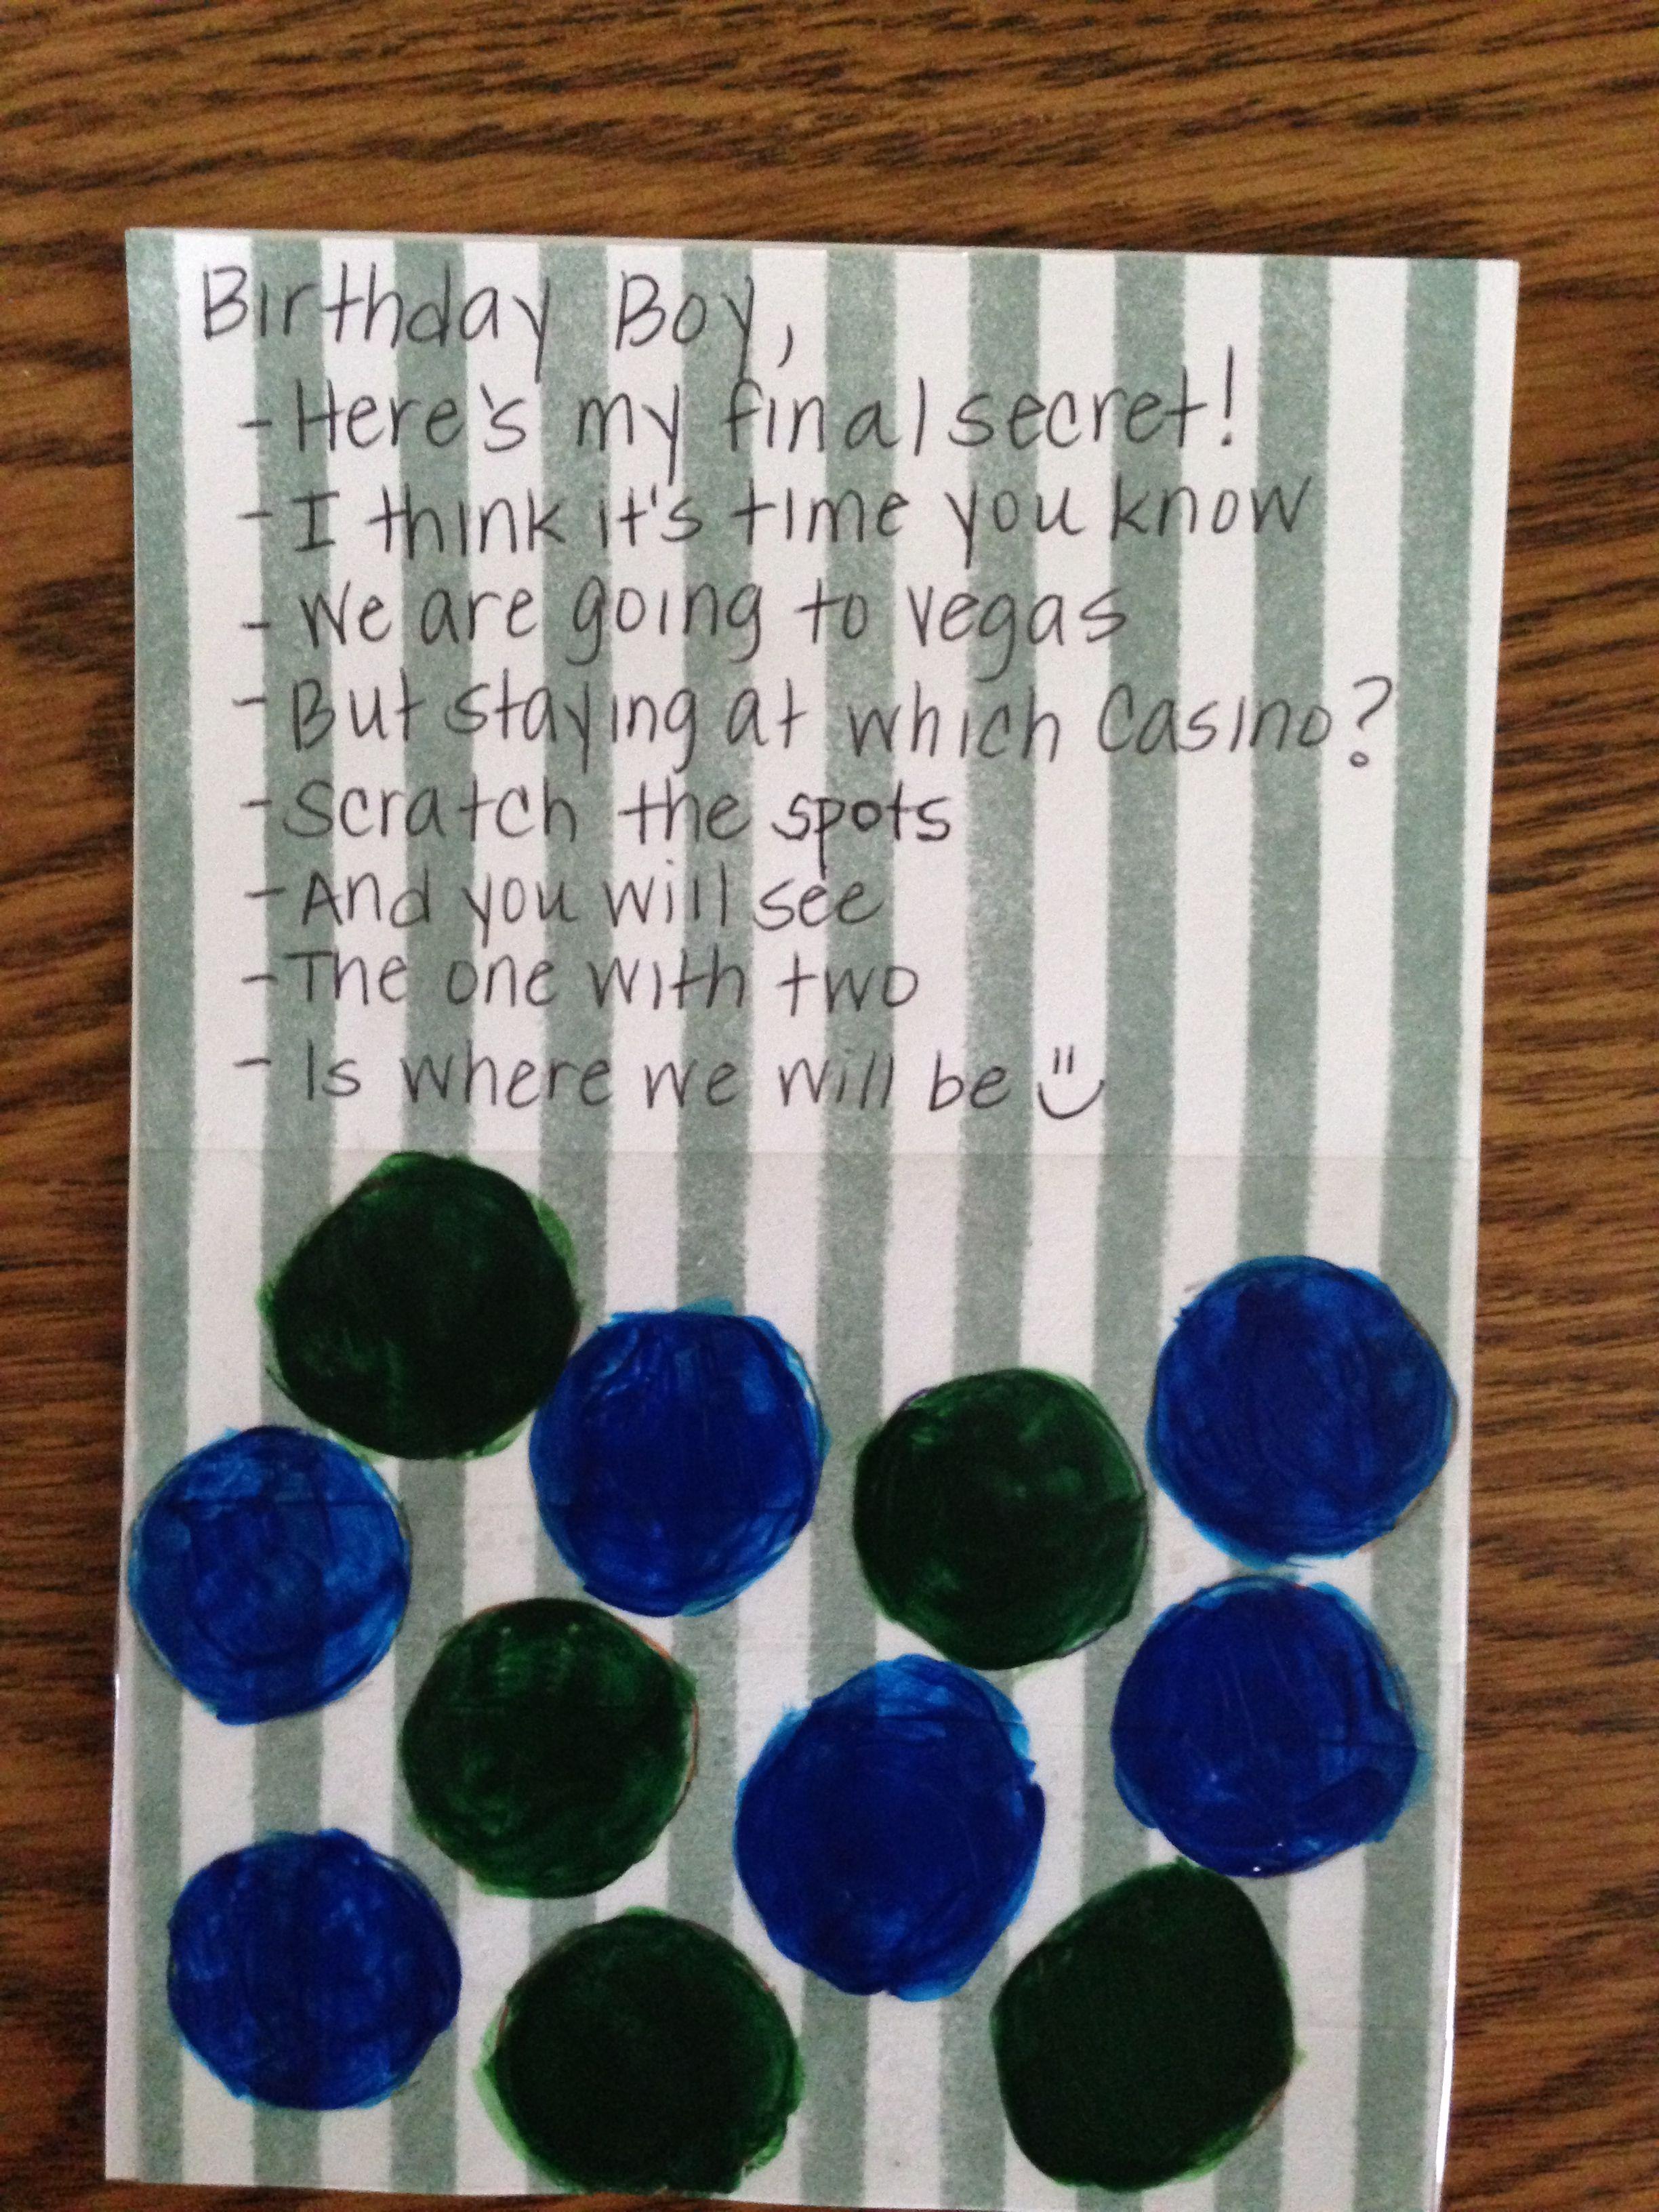 Second part of my boyfriends 30th bday gift DIY scratchers